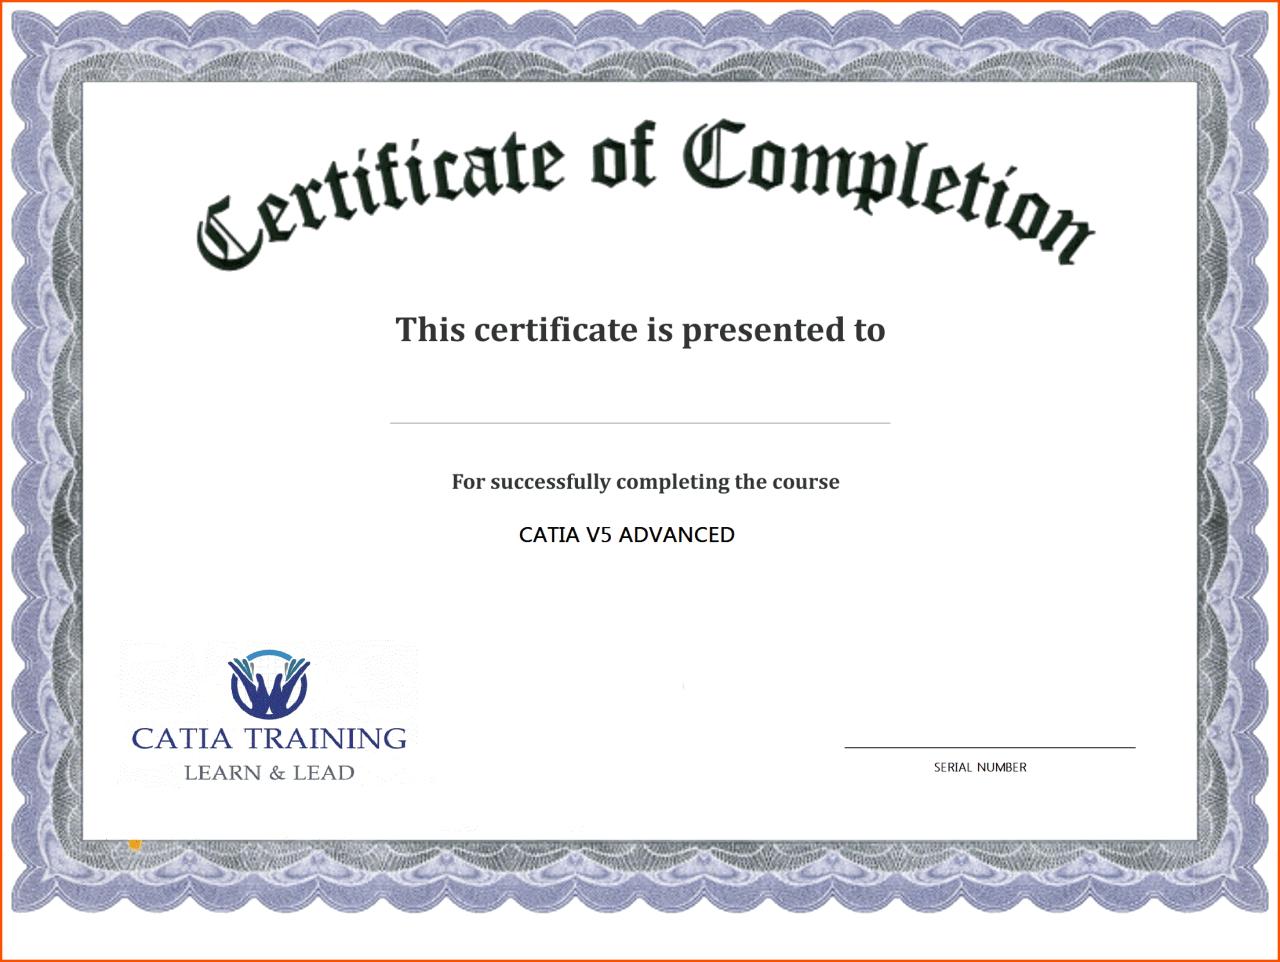 Certificate Template Free Printable - Free Download For Blank Certificate Templates Free Download